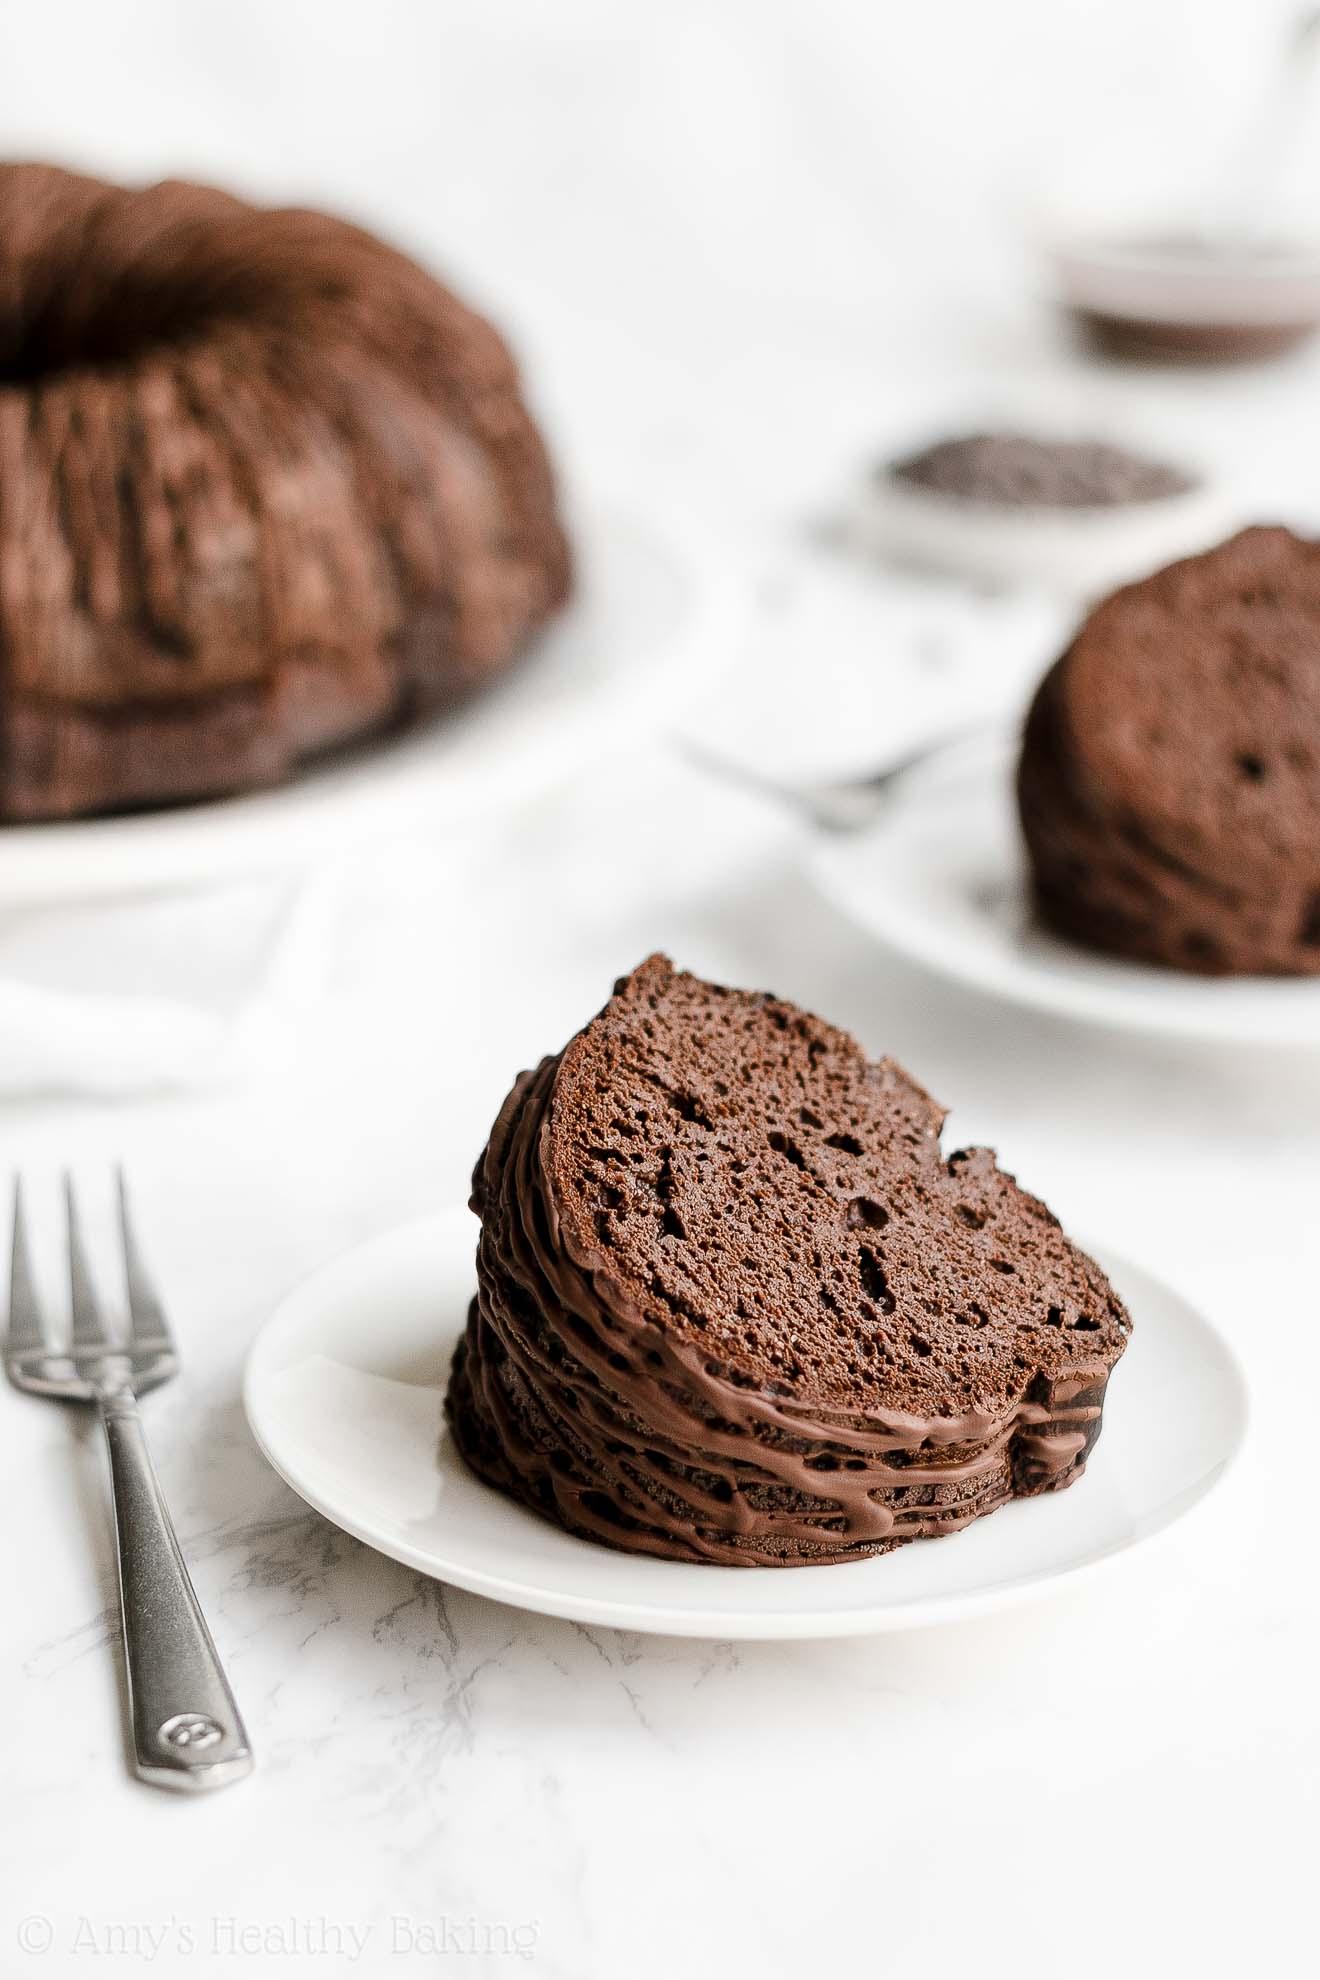 ULTIMATE Best Ever Easy Healthy Moist Double Dark Chocolate Bundt Cake